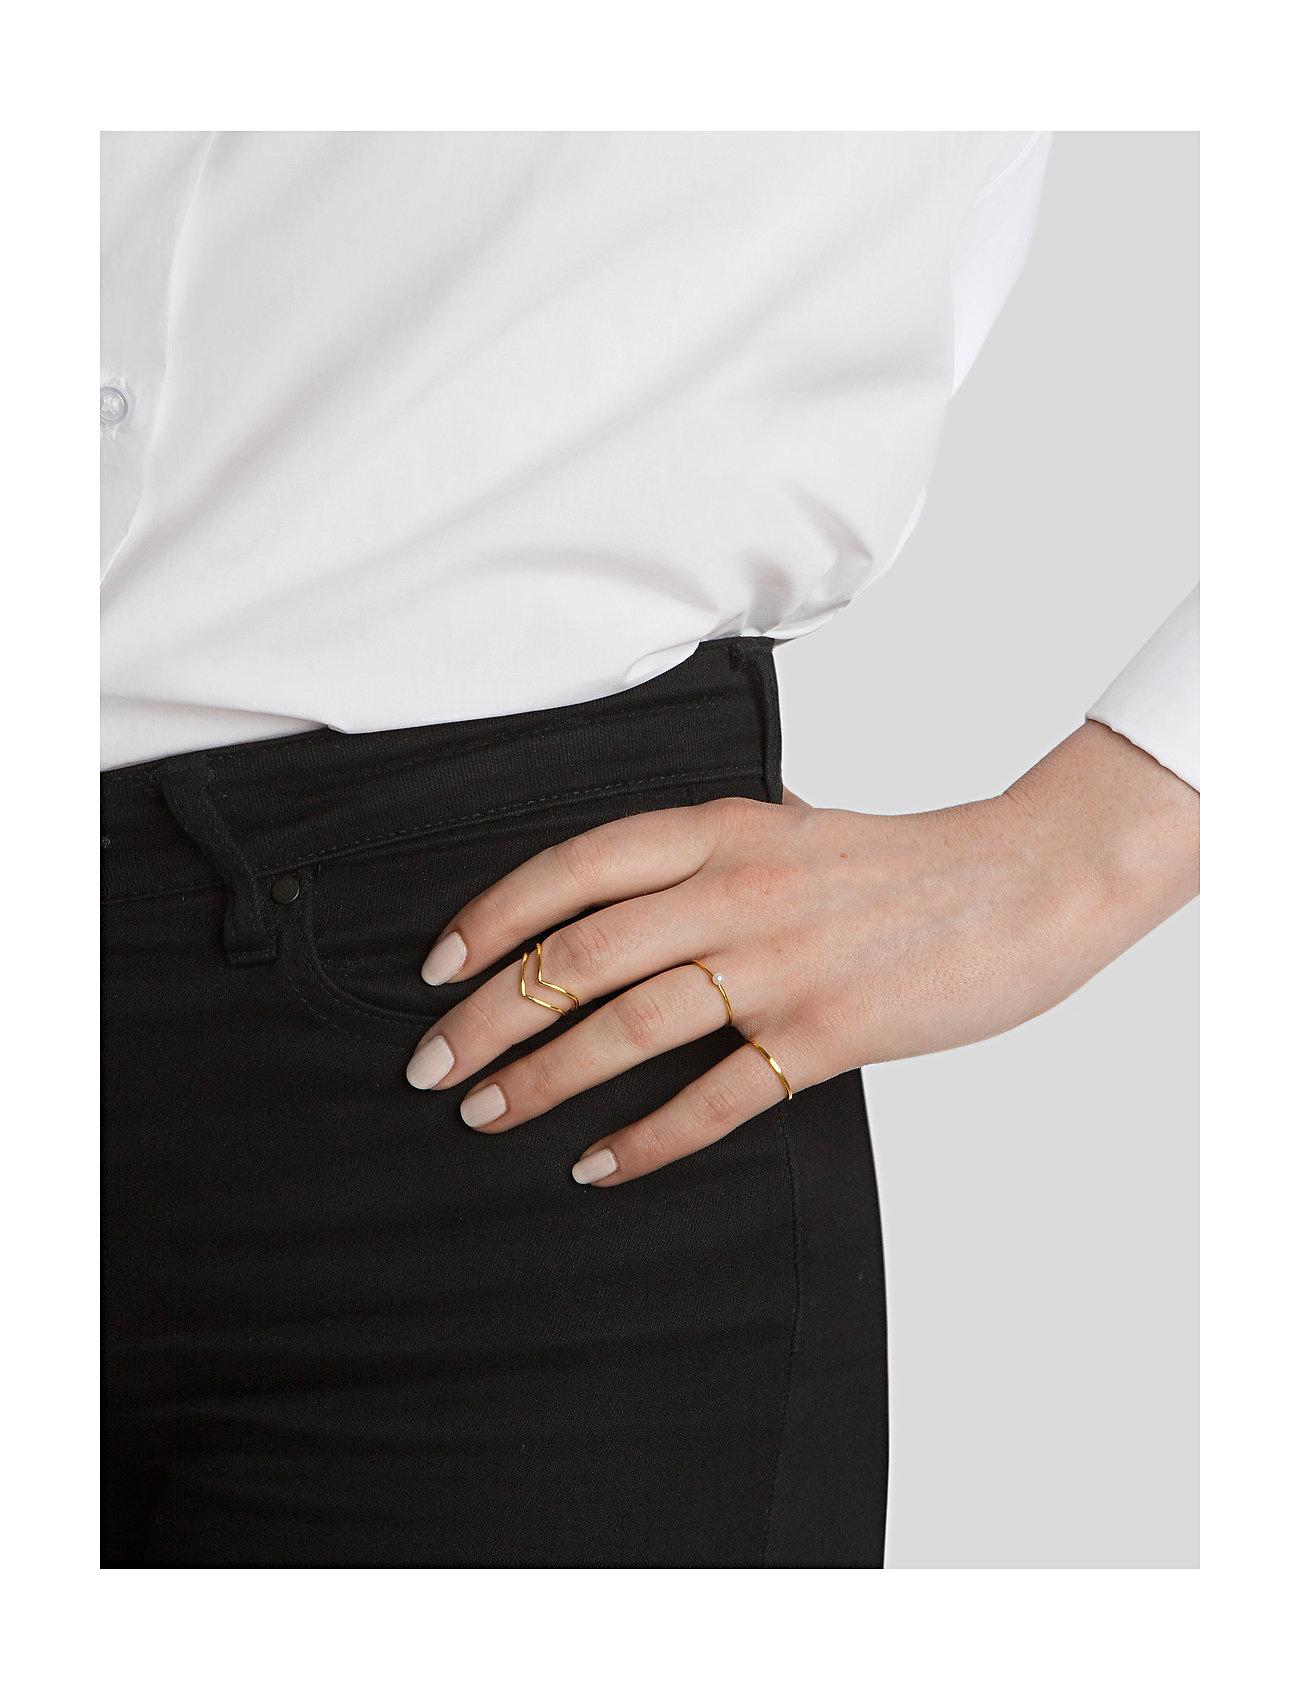 Syster P Tiny Plain Ring Gold - Biżuteria GOLD - Akcesoria